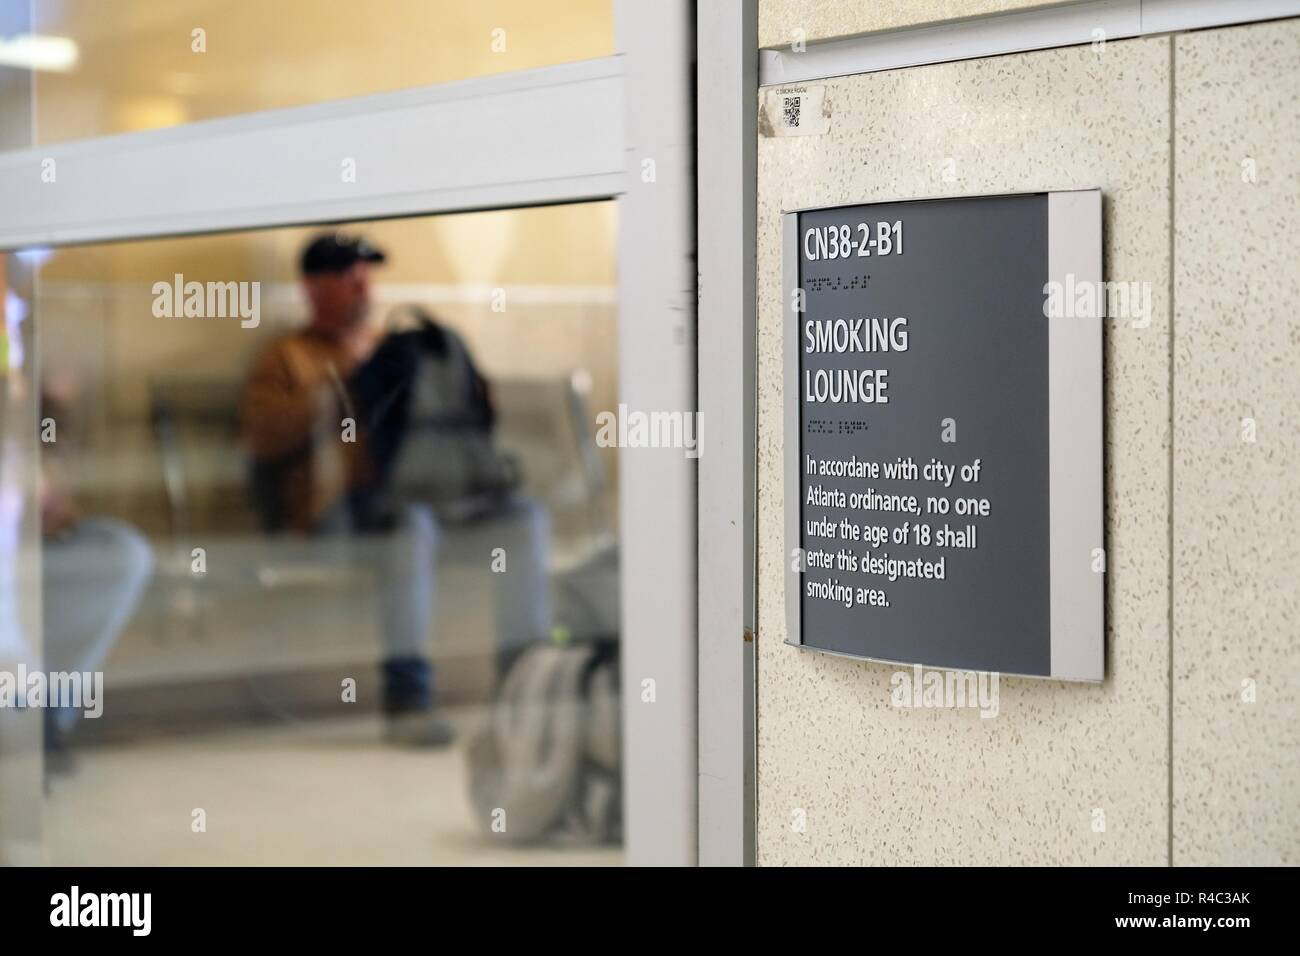 Smoking lounge at Terminal C in Hartsfield-Jackson Atlanta International Airport; Atlanta, Georgia, USA. - Stock Image